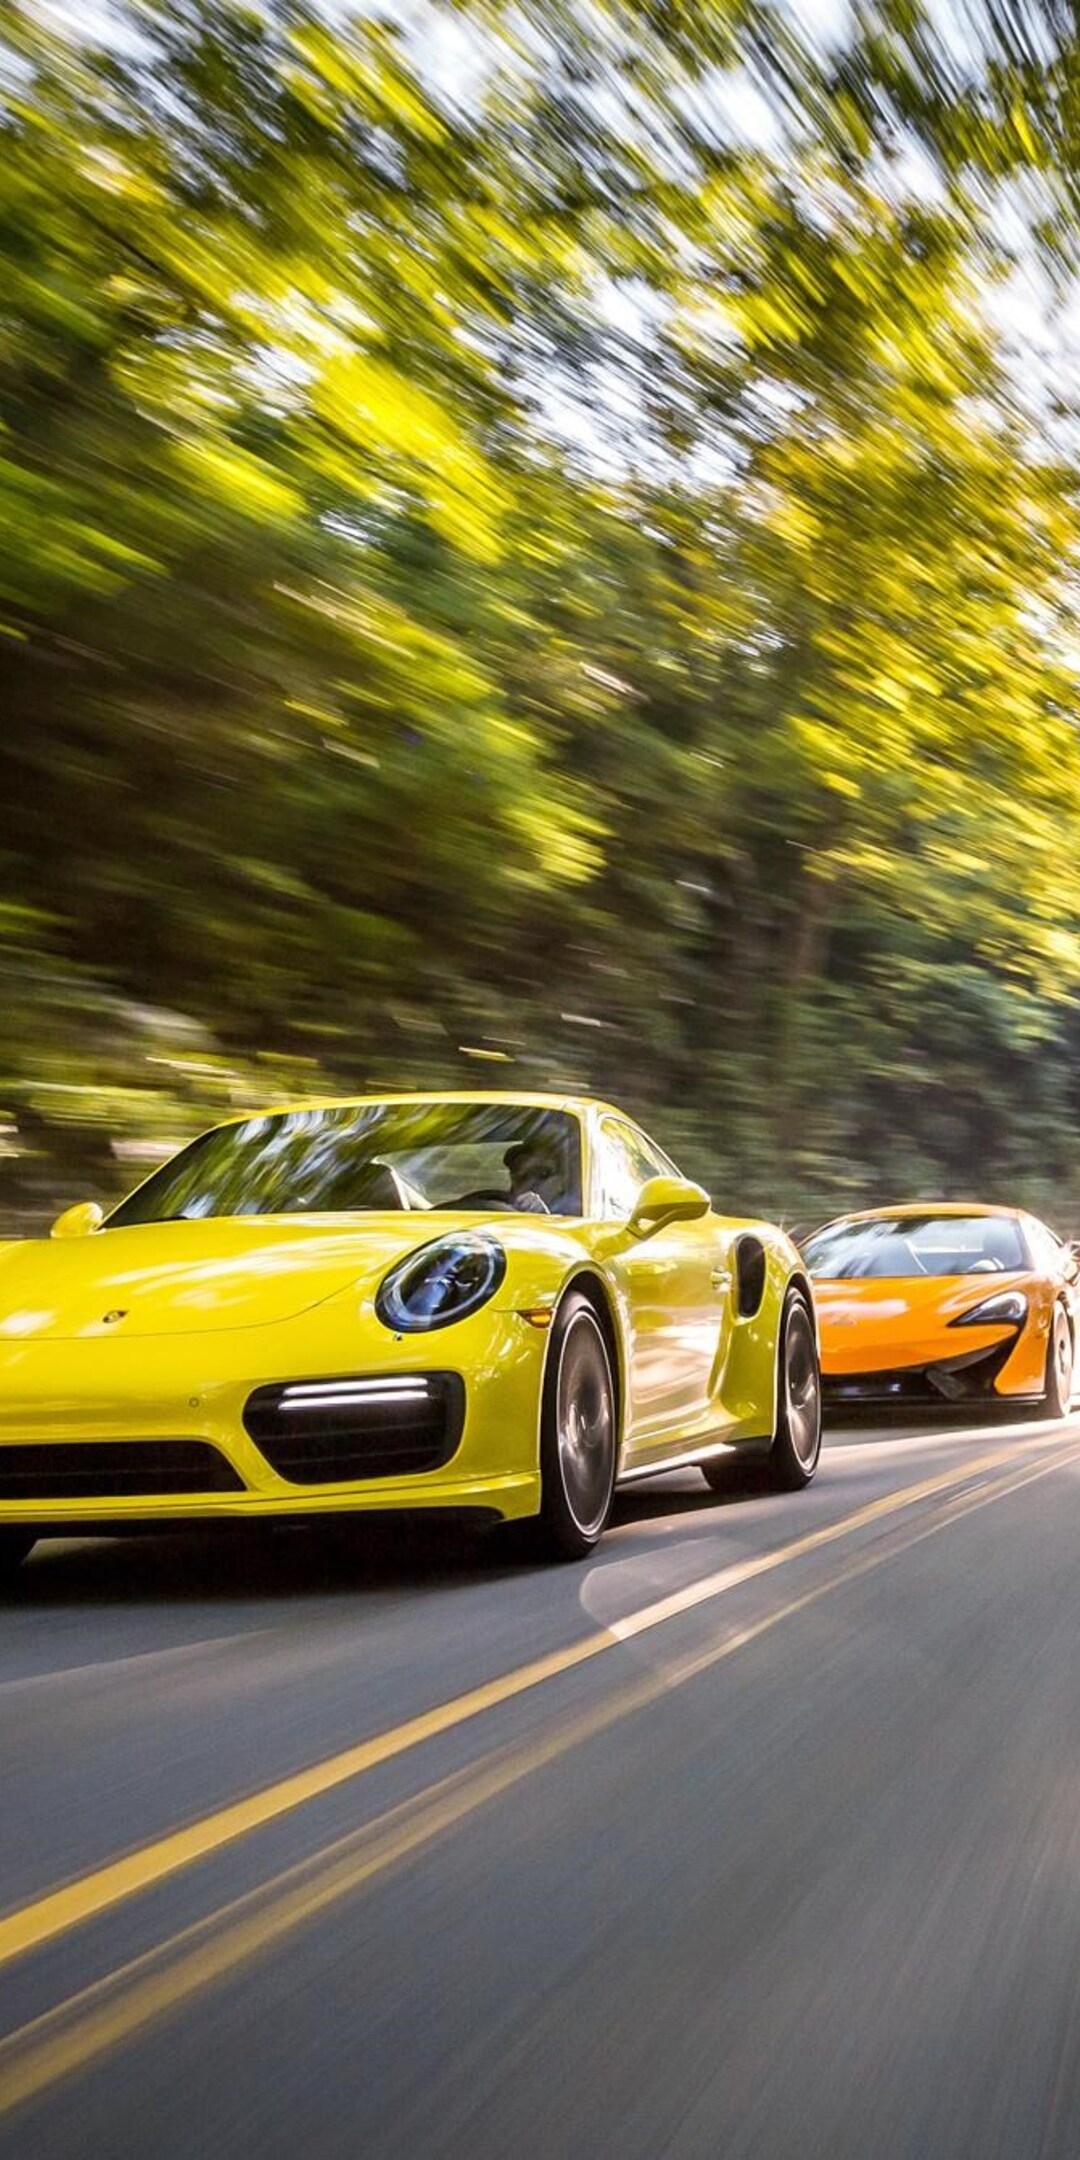 2017-porsche-turbo-911-turbo-sd.jpg